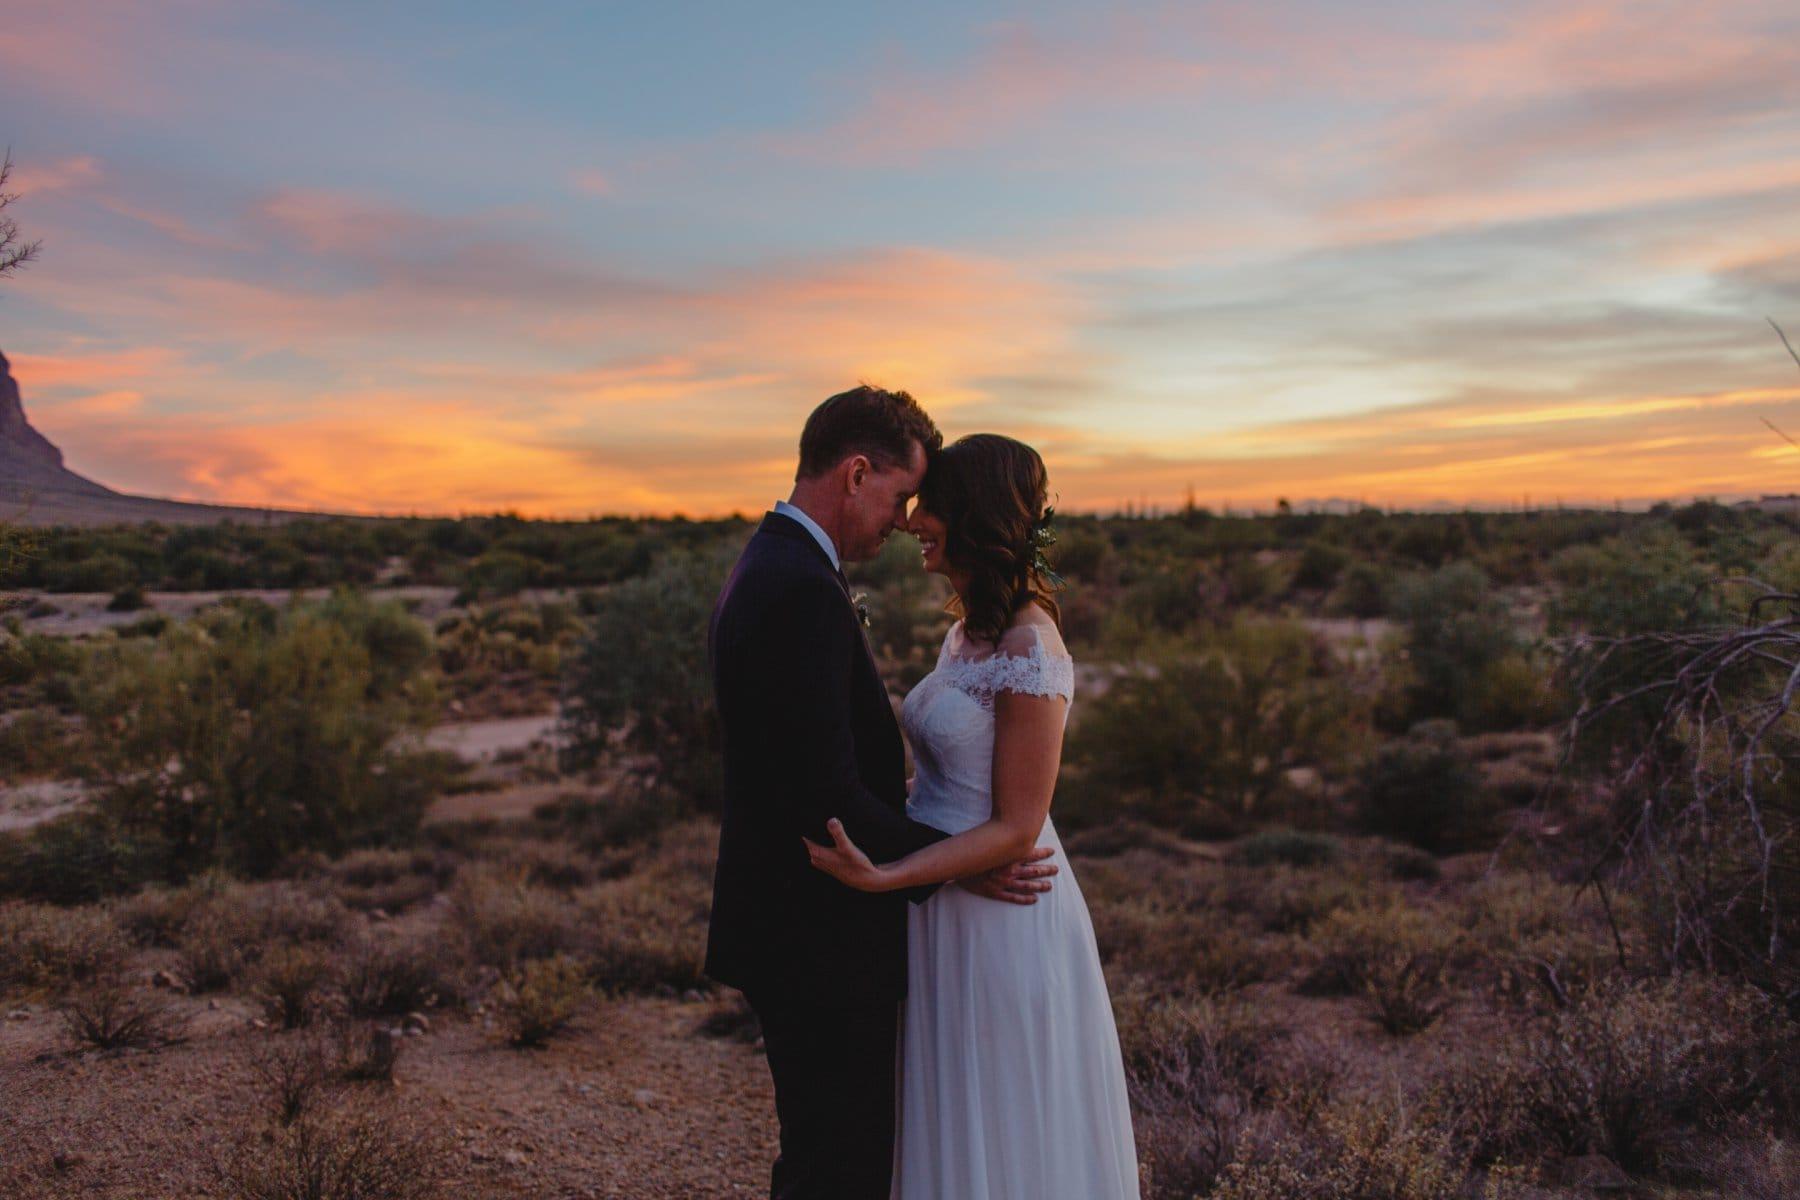 Arizona sunset elopement beautiful clouds